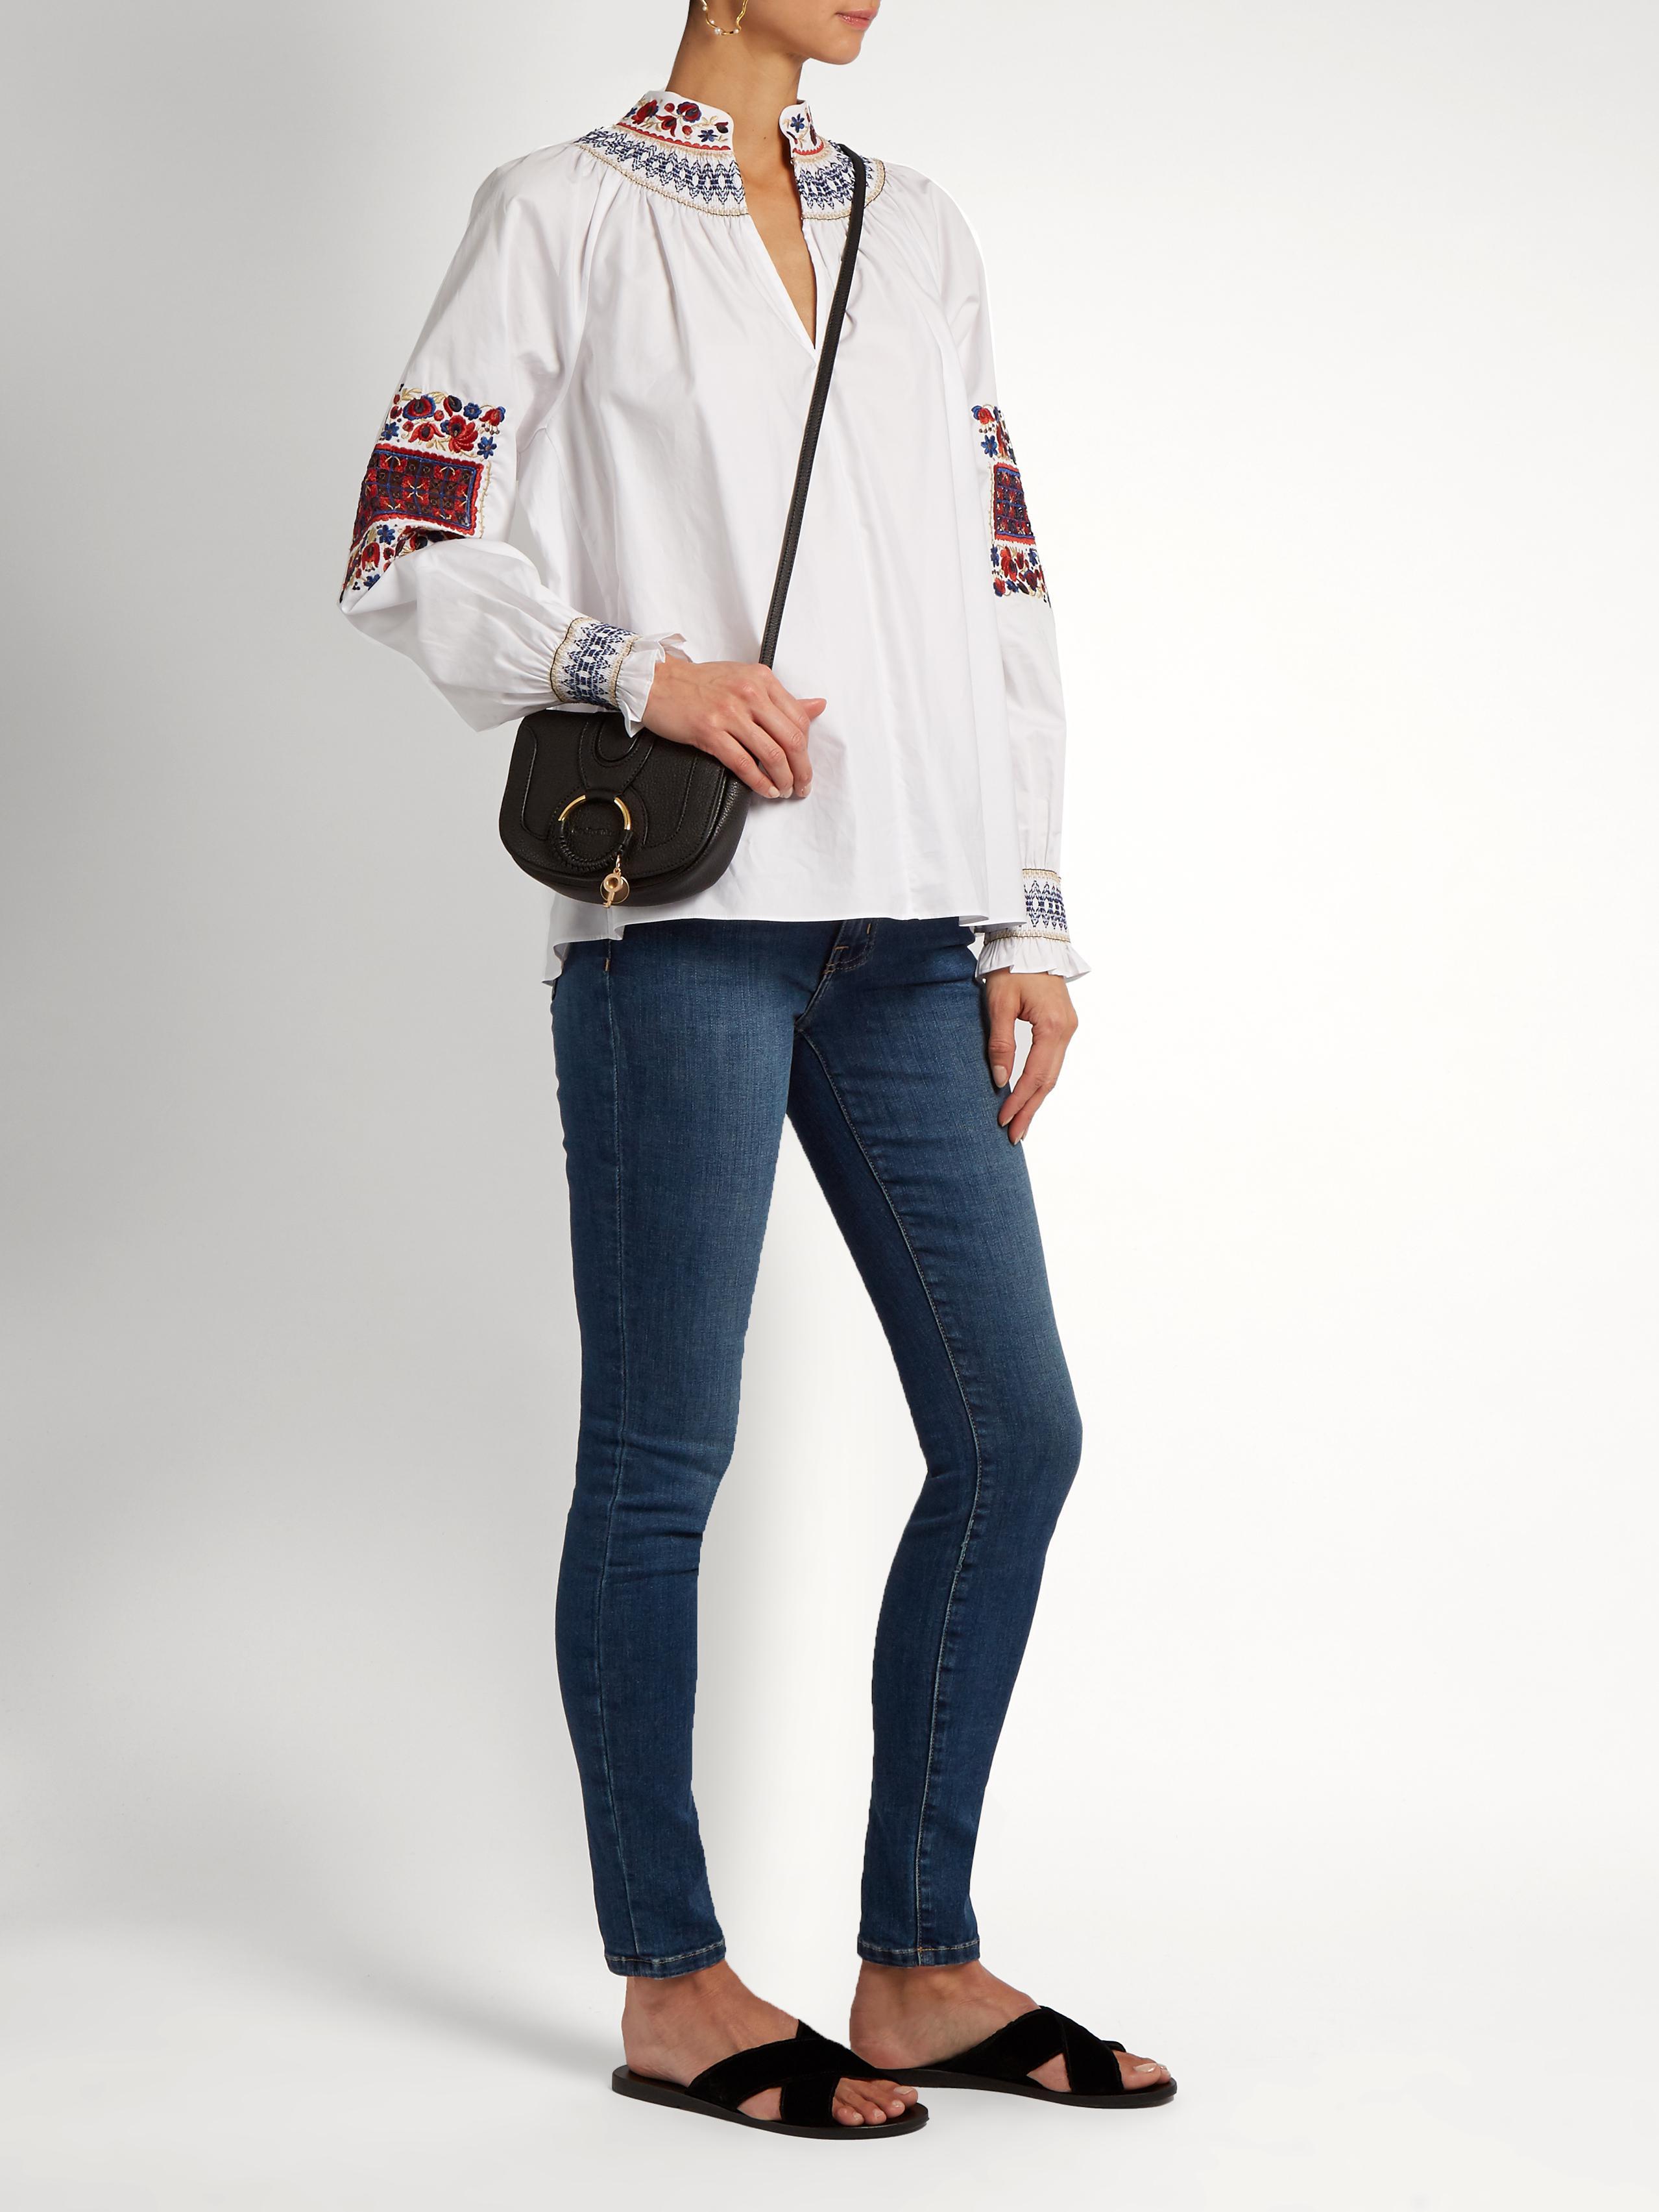 a948e4f38d524 Lyst - See By Chloé Hana Mini Leather Cross-body Bag in Black